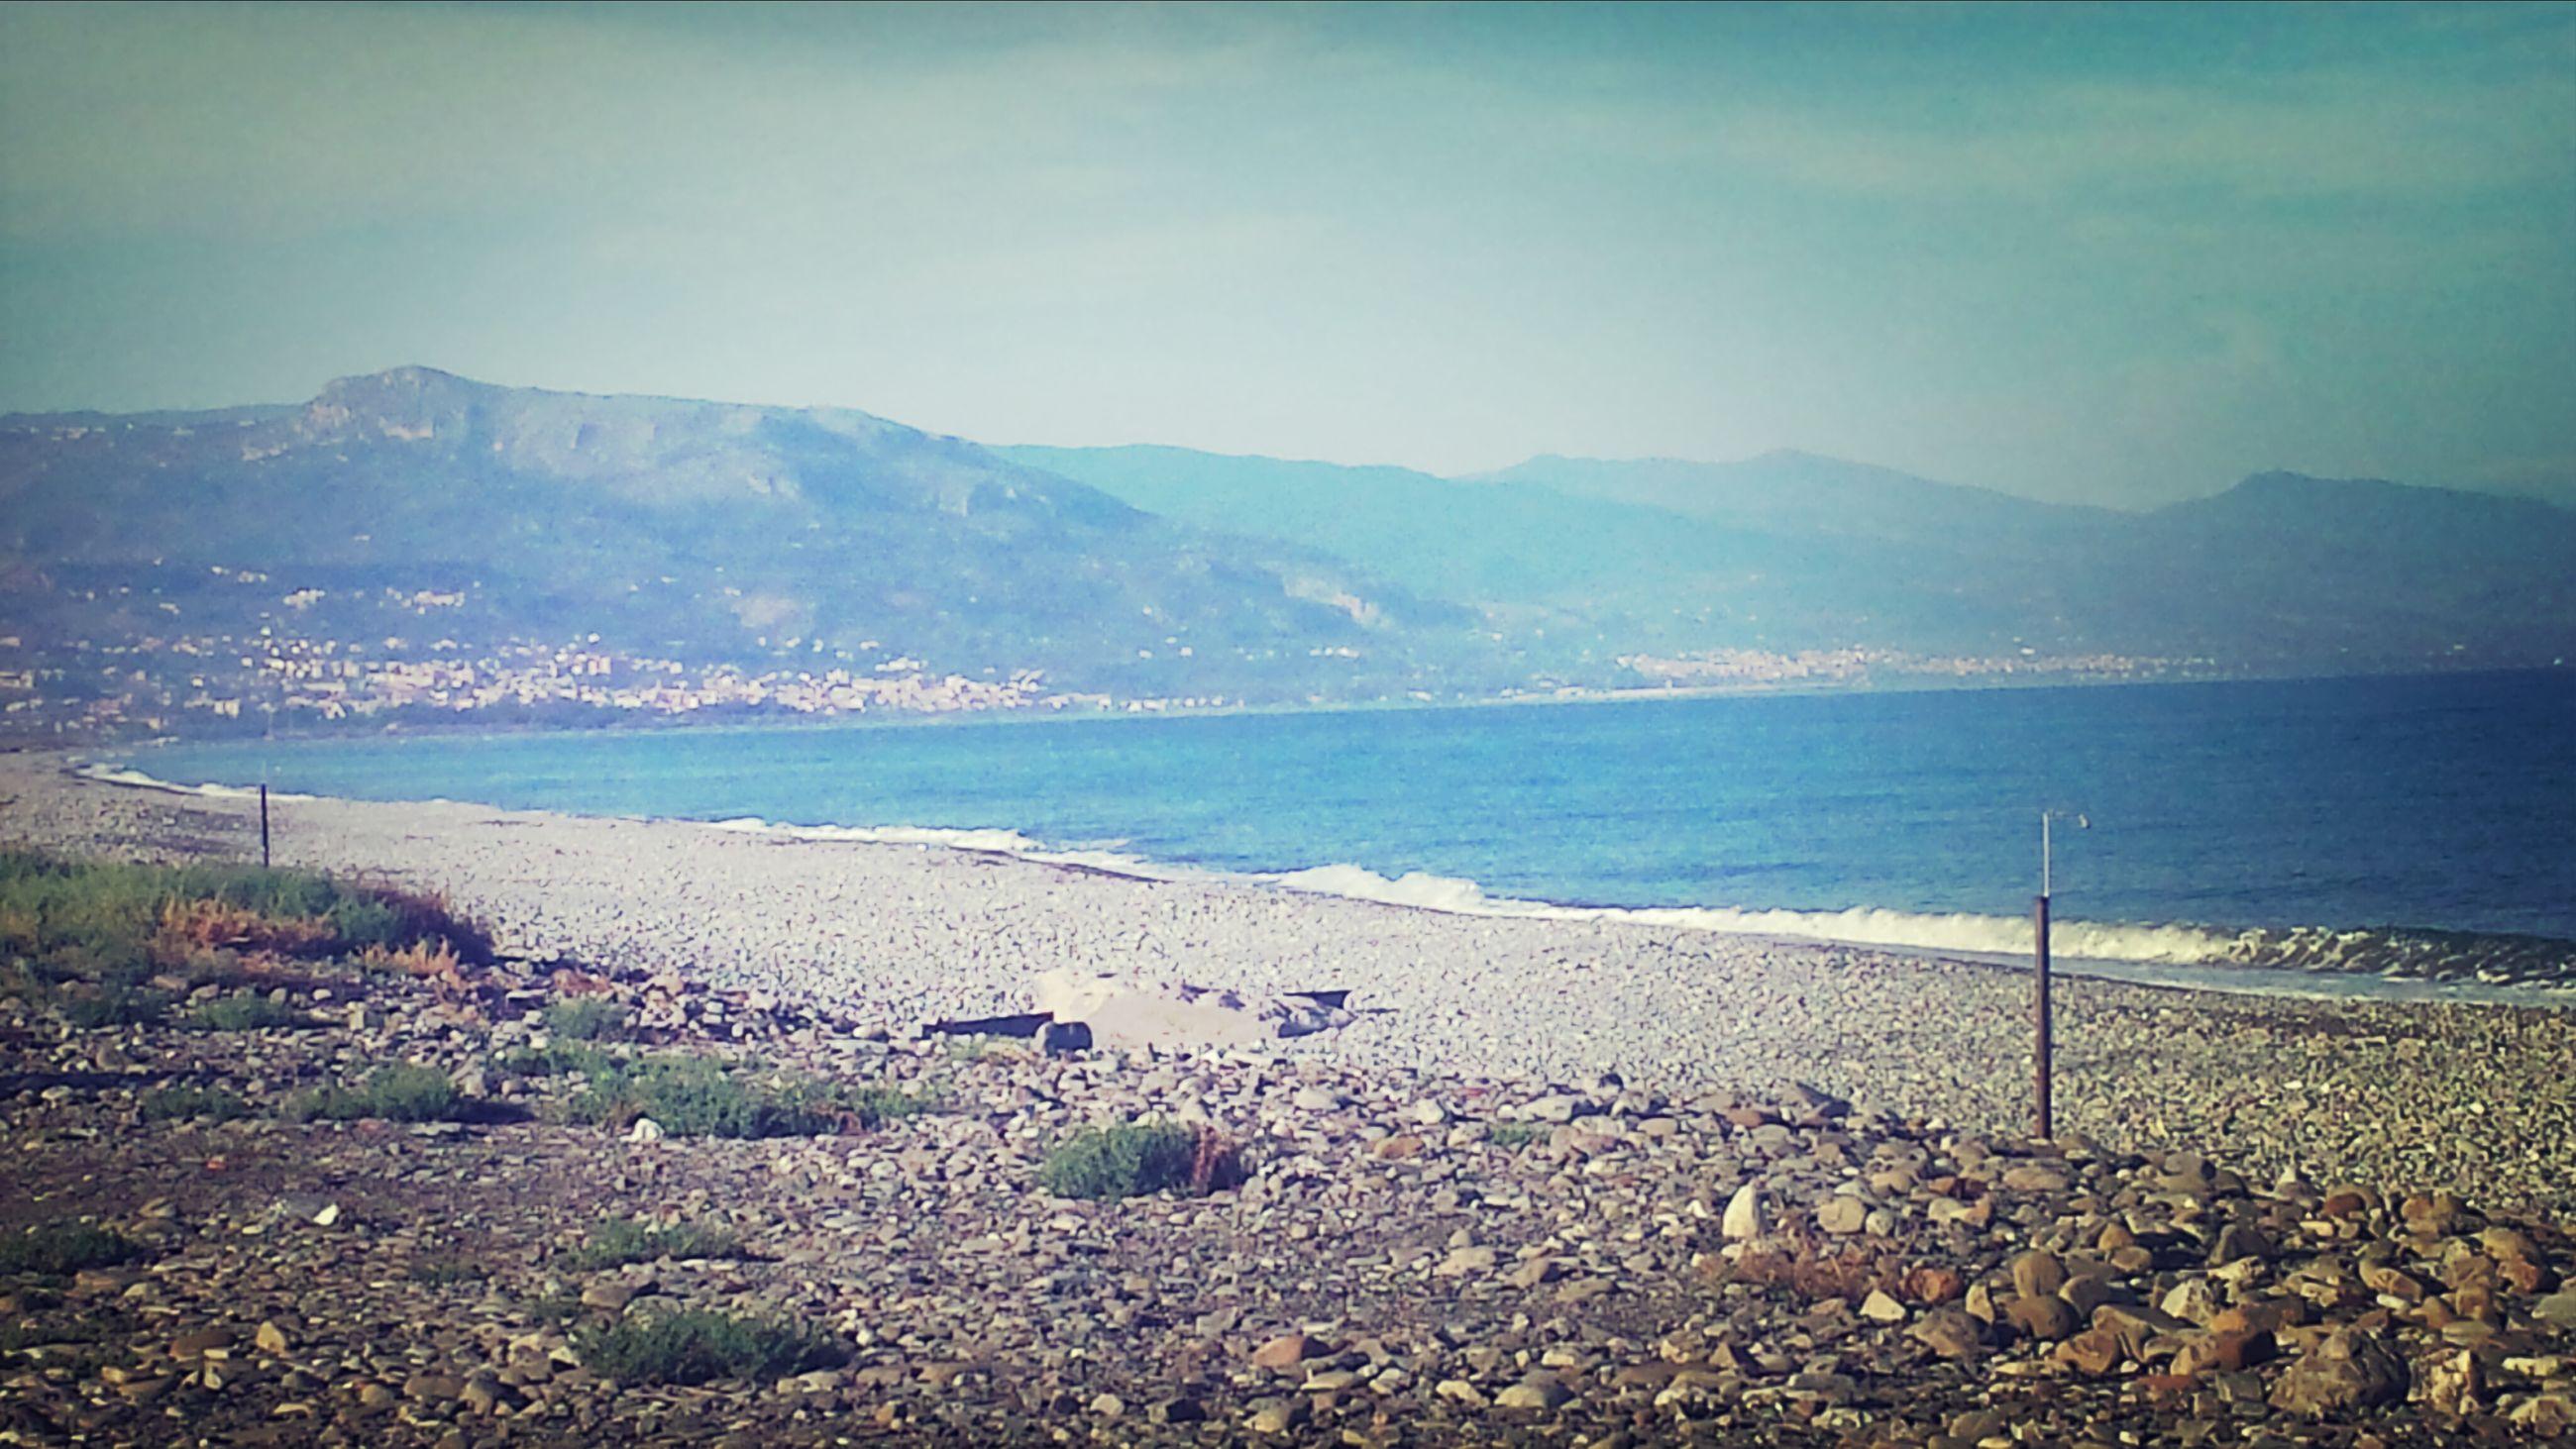 water, beach, sea, tranquil scene, mountain, scenics, shore, tranquility, sky, beauty in nature, sand, nature, coastline, mountain range, idyllic, rock - object, remote, non-urban scene, outdoors, day